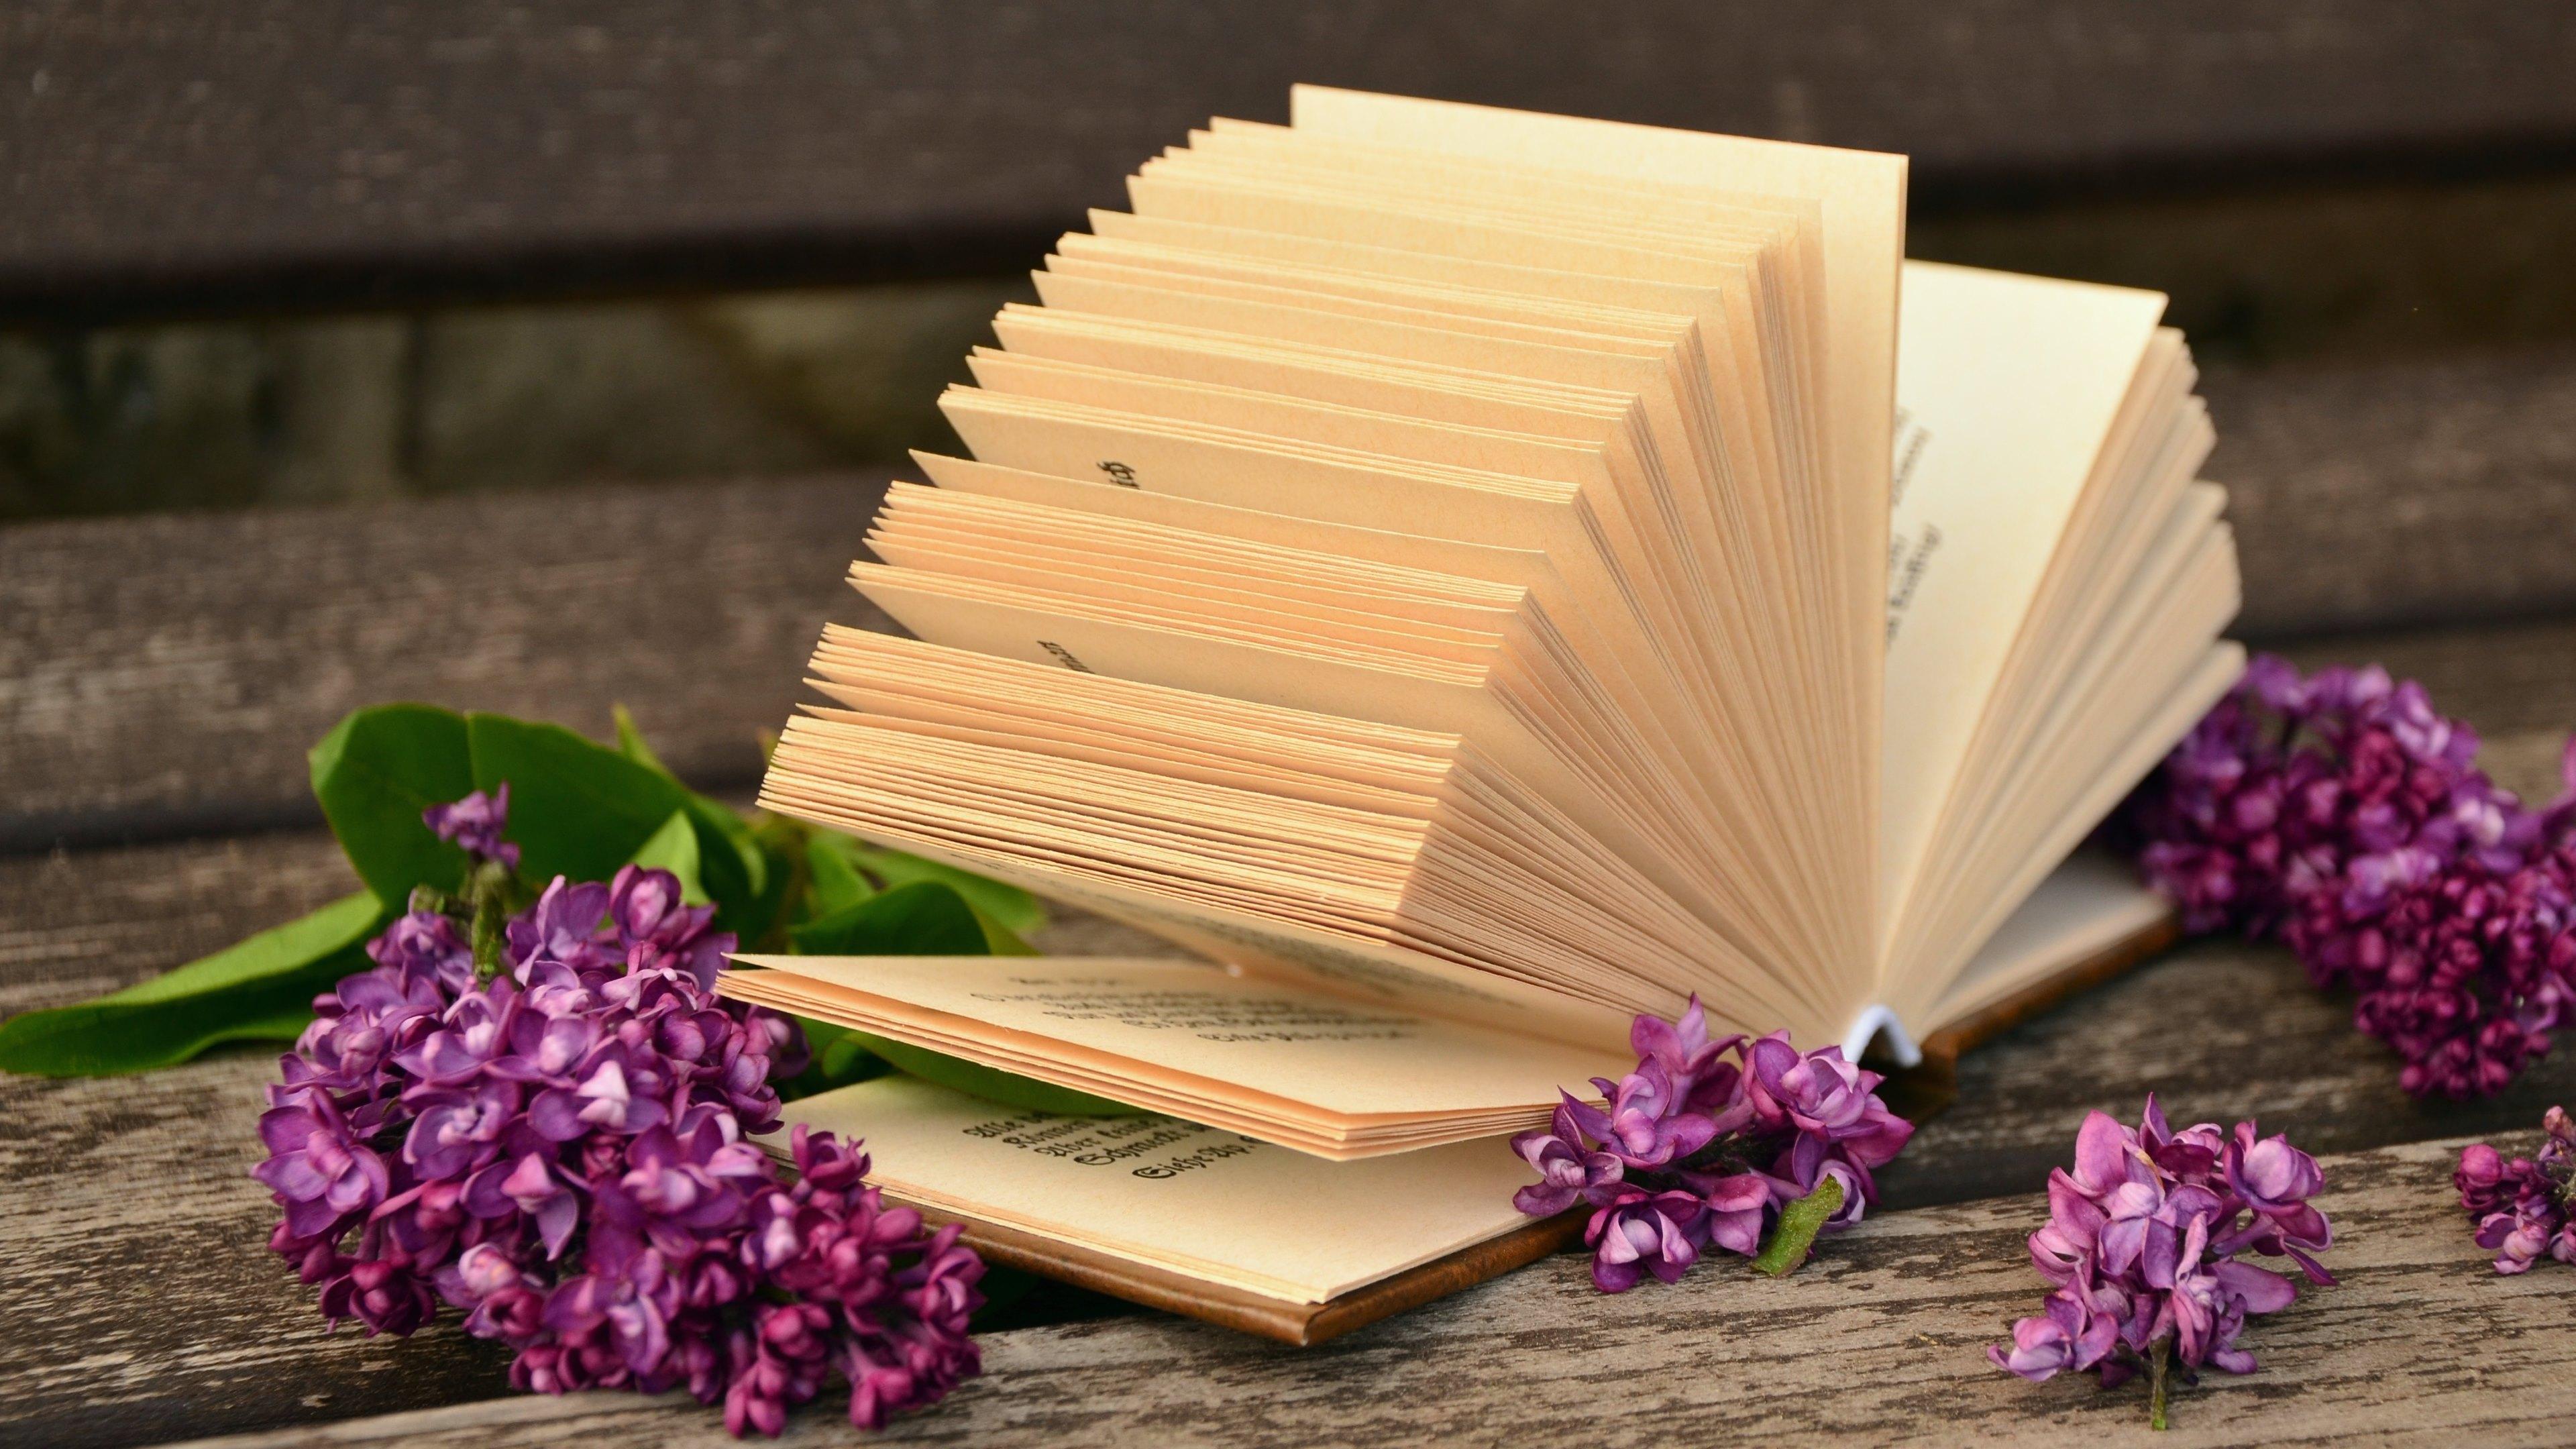 Desktop Wallpaper Book Quotes Lilac Flowers And A Good Book Computer Wallpapers Desktop